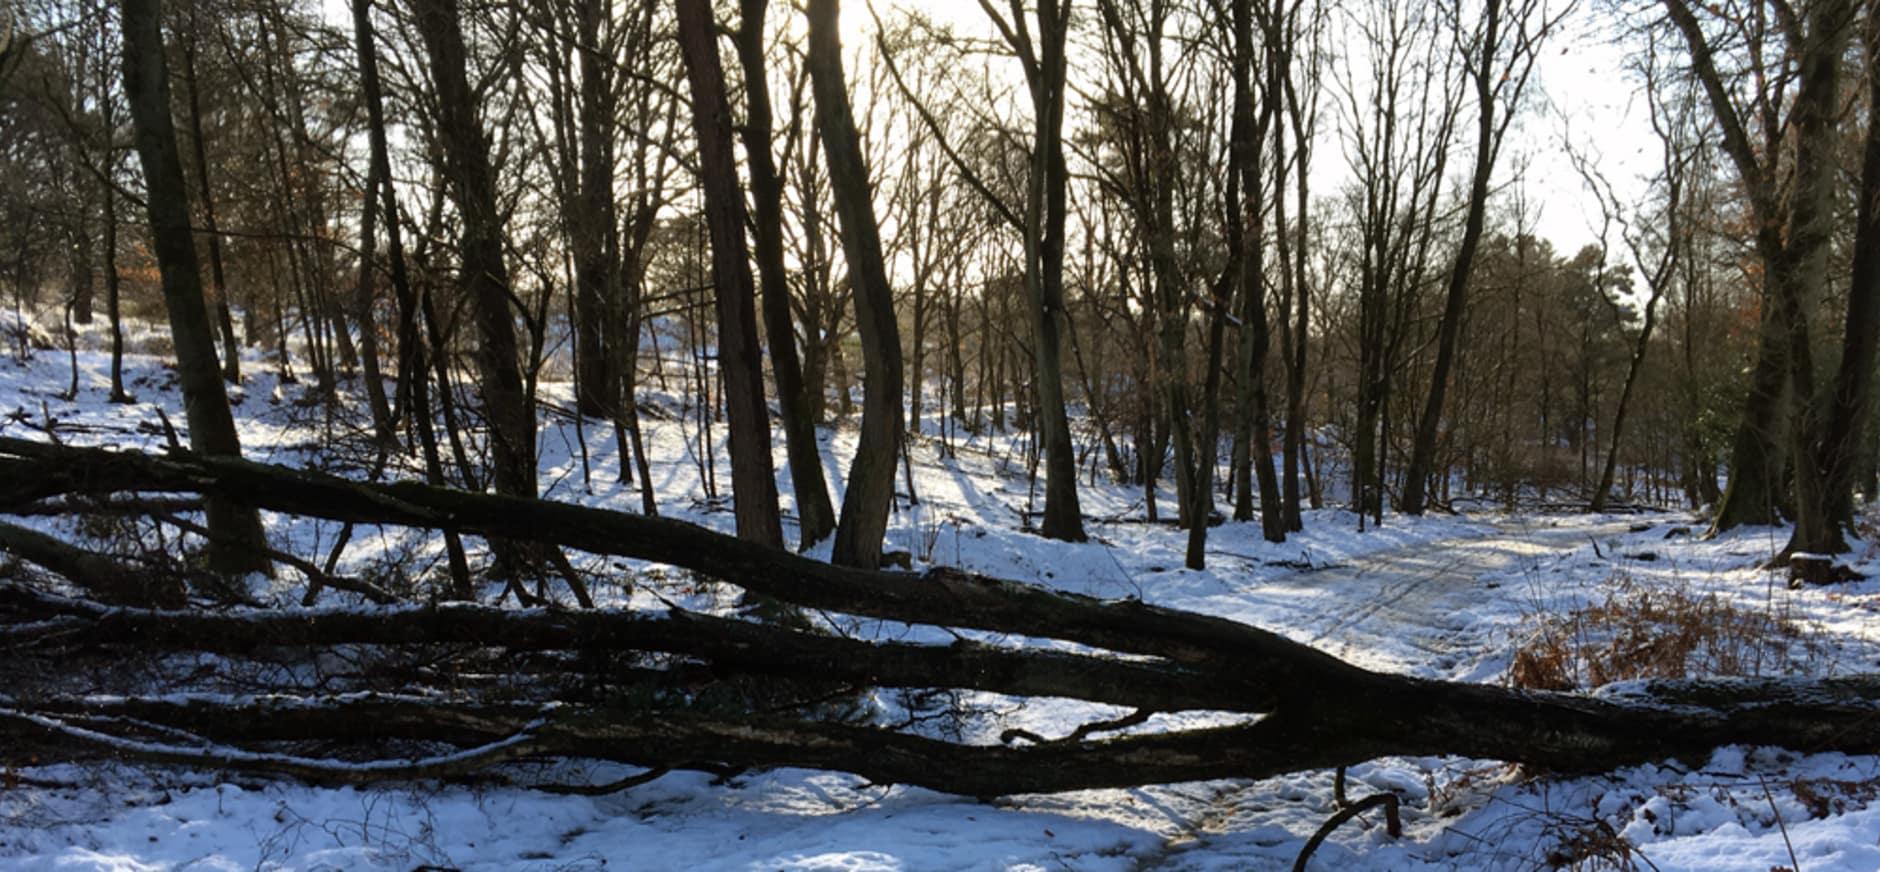 Winterse omstandigheden op Veluwezoom: plan je wandeling